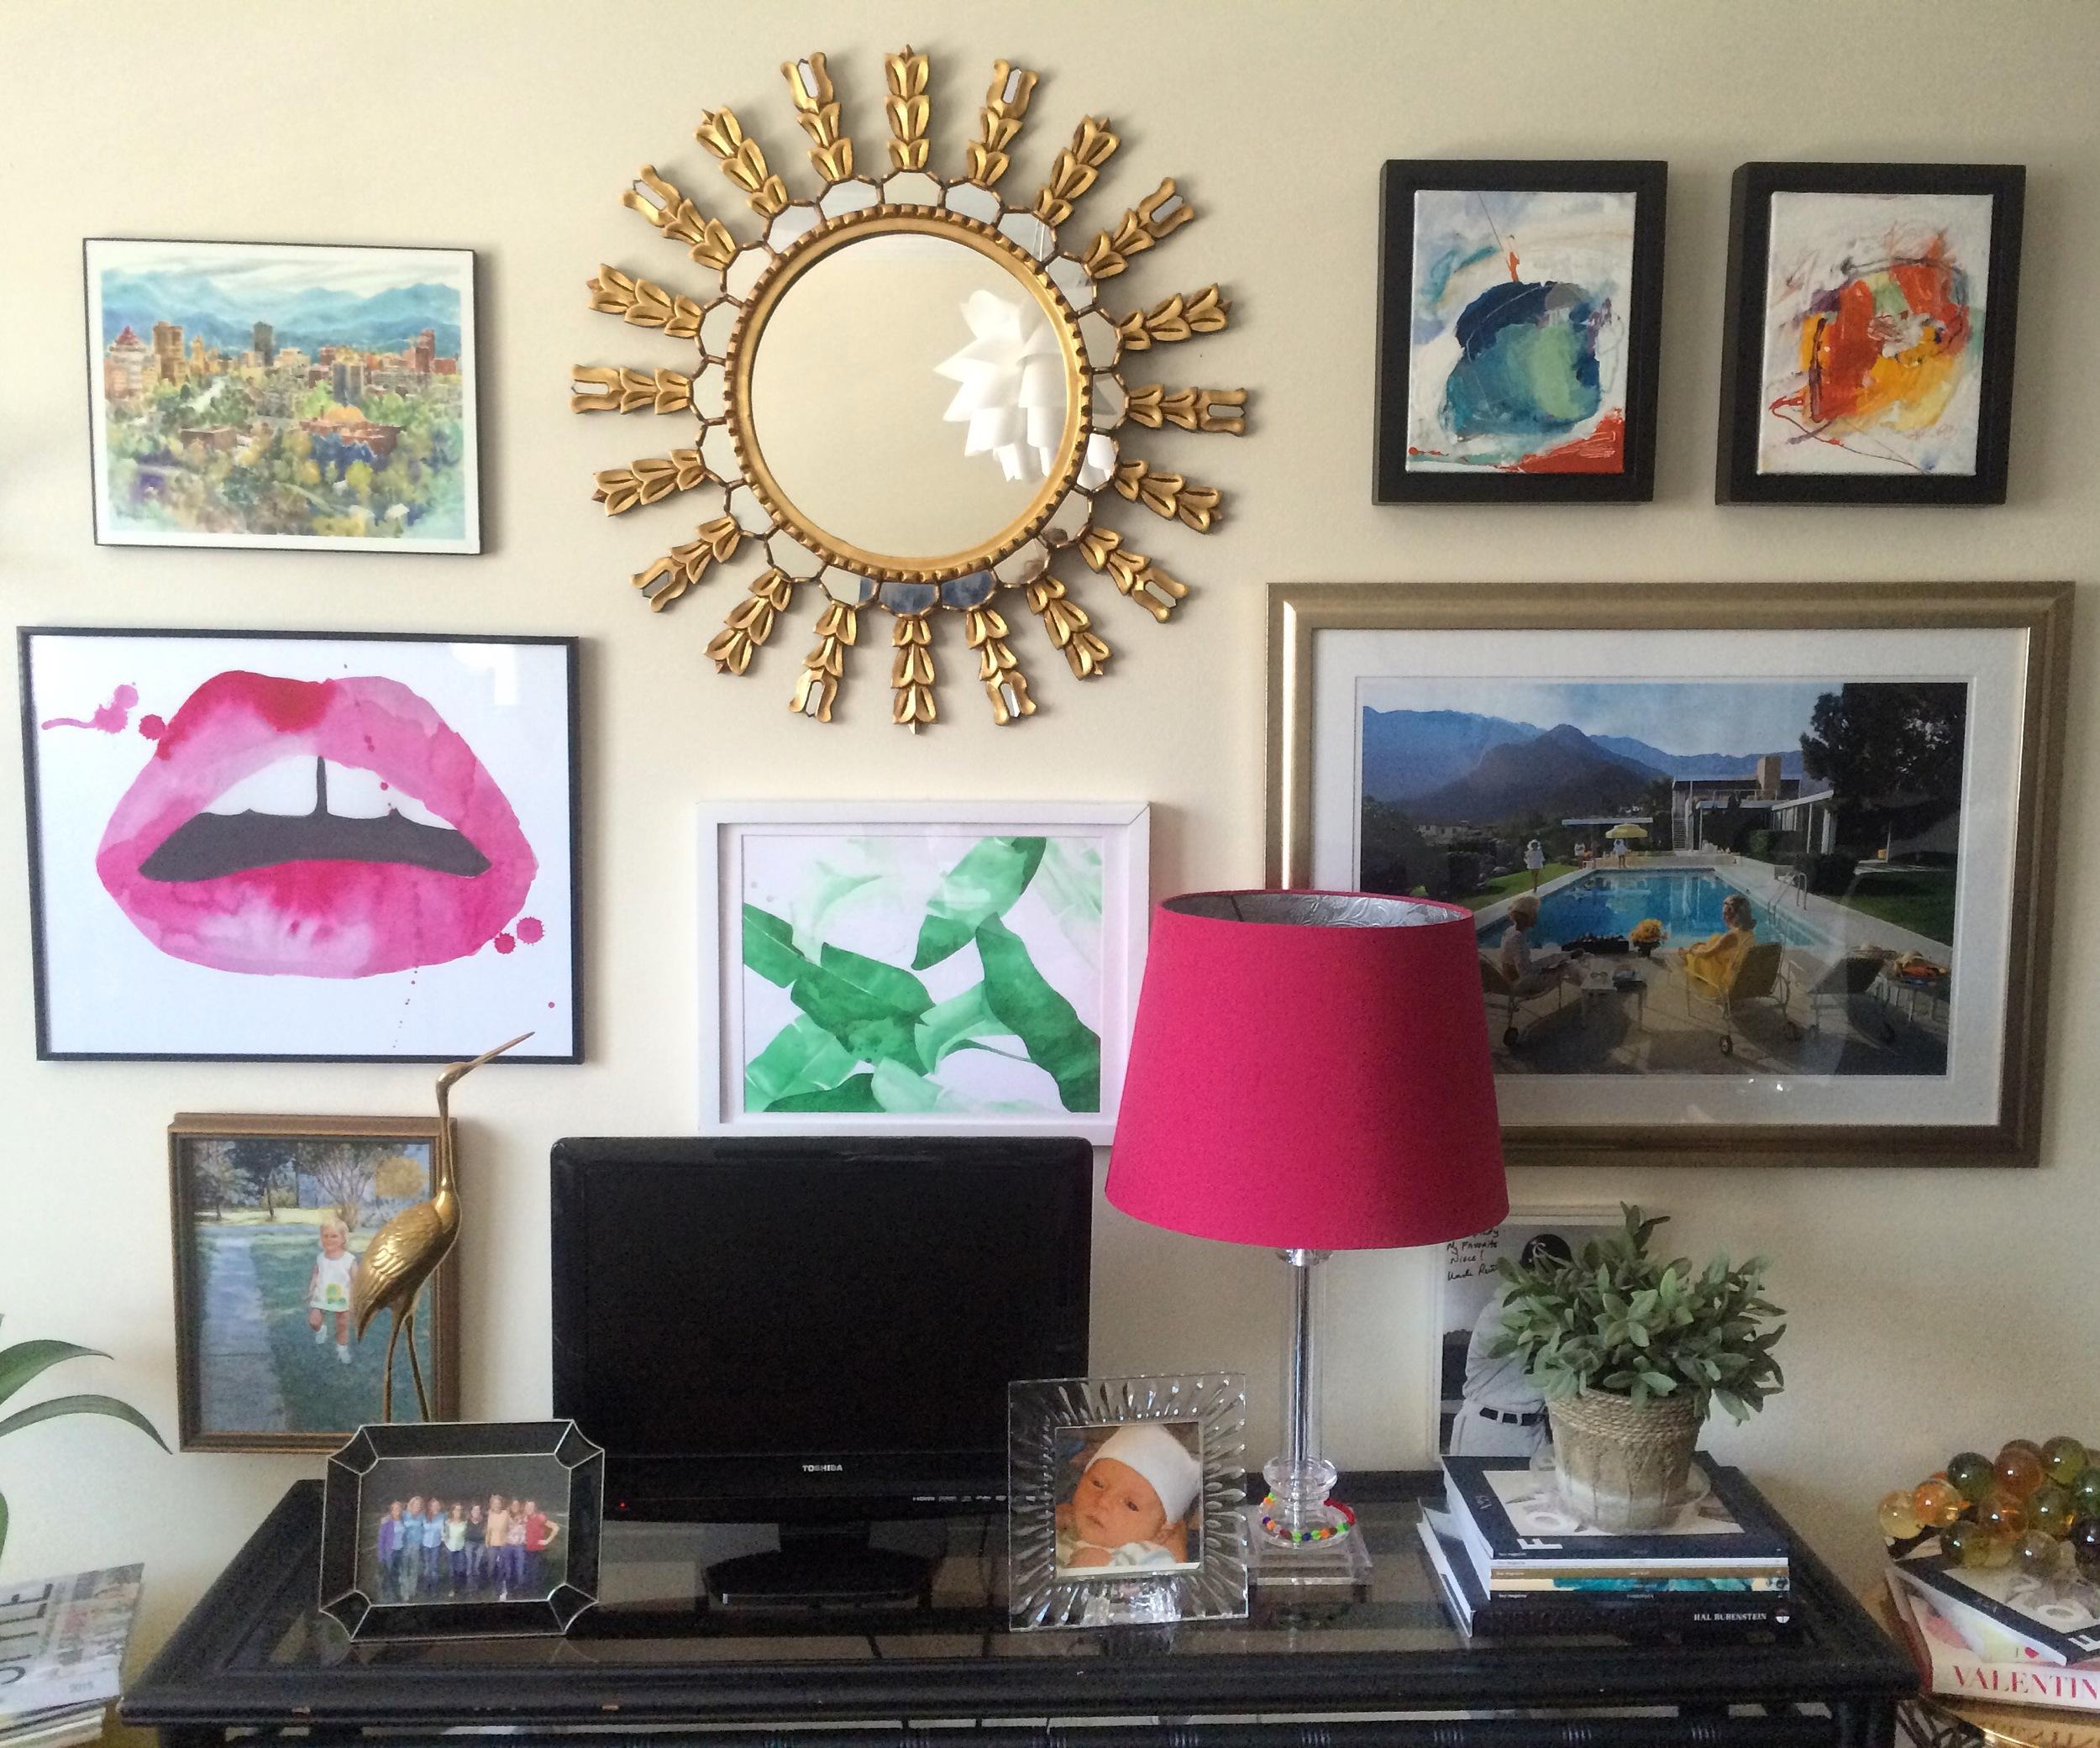 Gallery Wall Slim Aarons The Aestate One Kings Lane Sunburst Mirror Taylor O Thomas Art Lips Print Palm Leaf Print